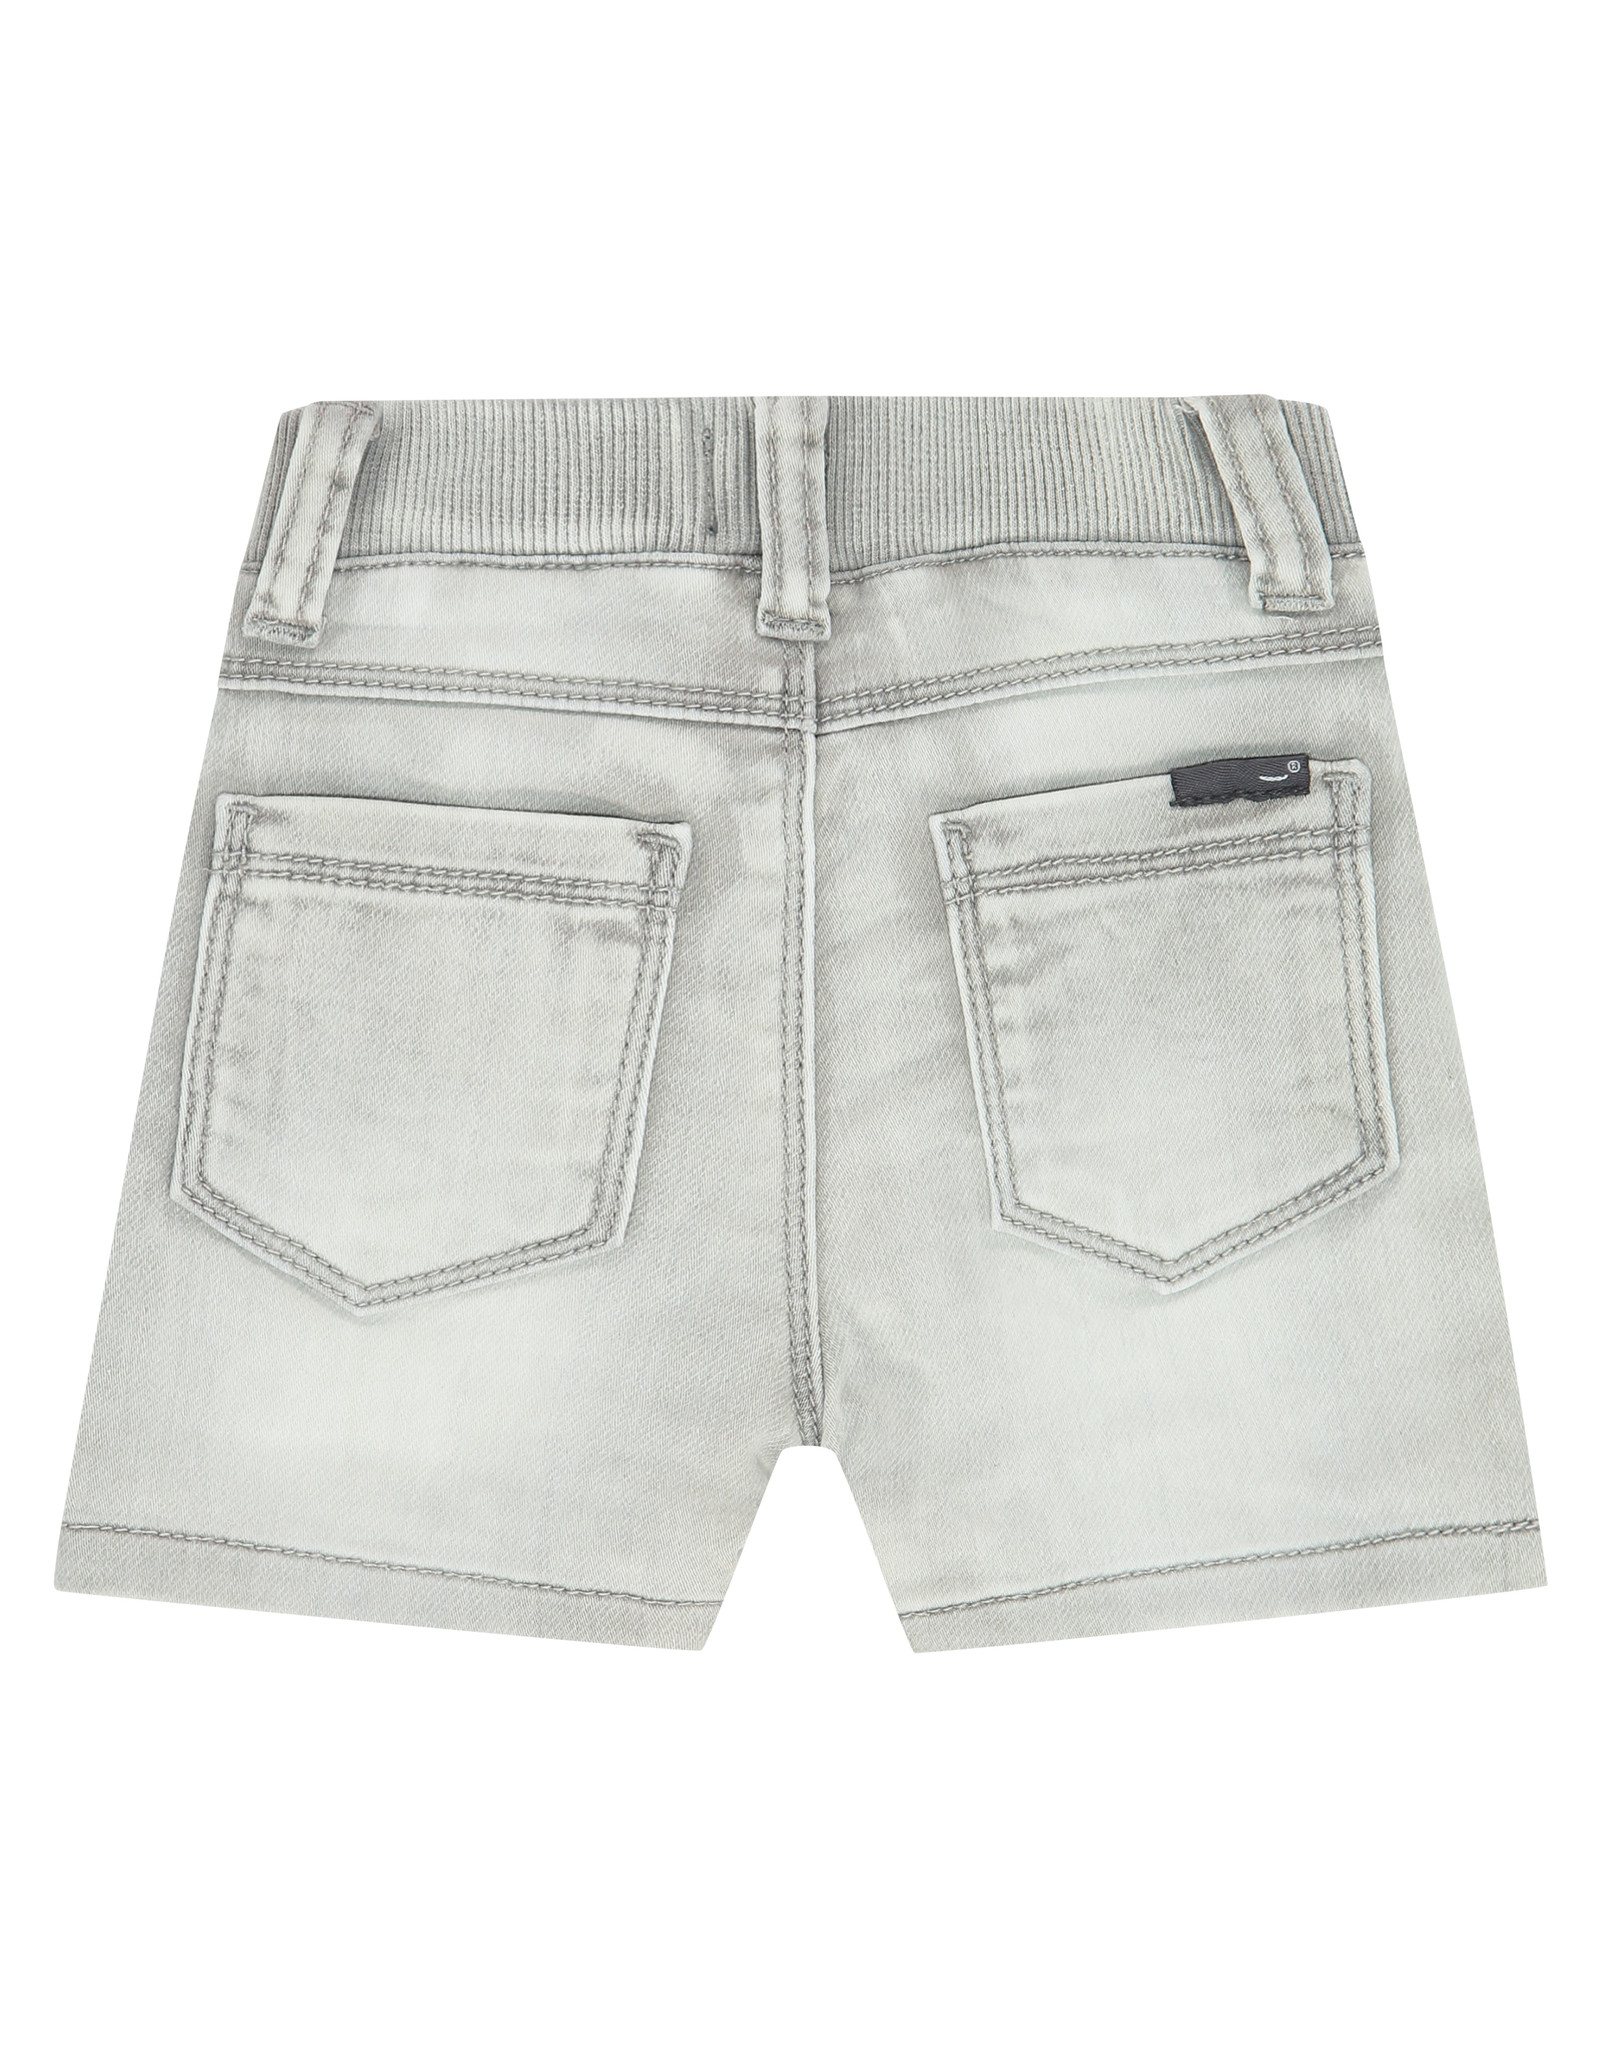 Babyface baby boys jogg jeans short, light grey denim, NWB21227253